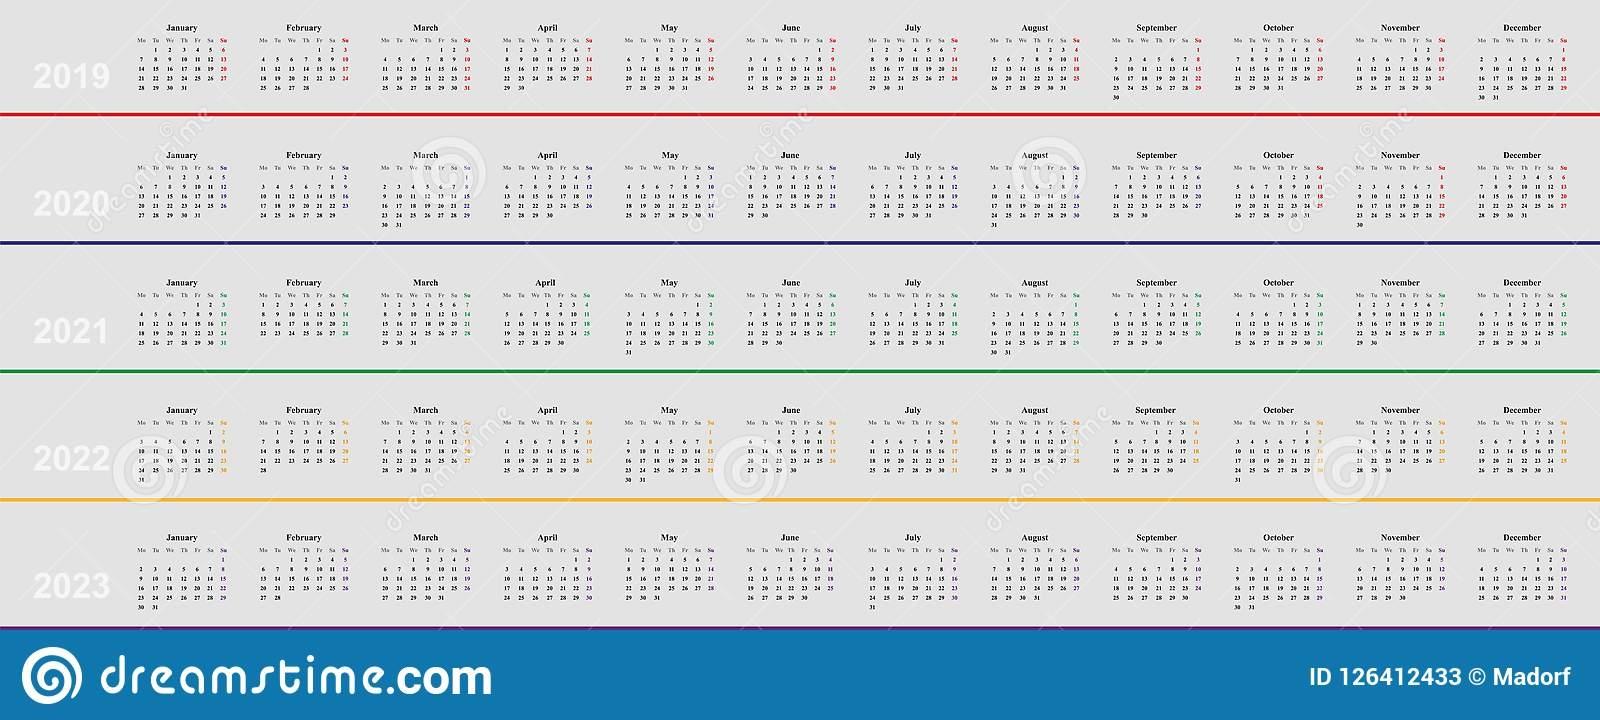 Calendar Template Fr Years 2019 2020 2021 2022 2023 Stock